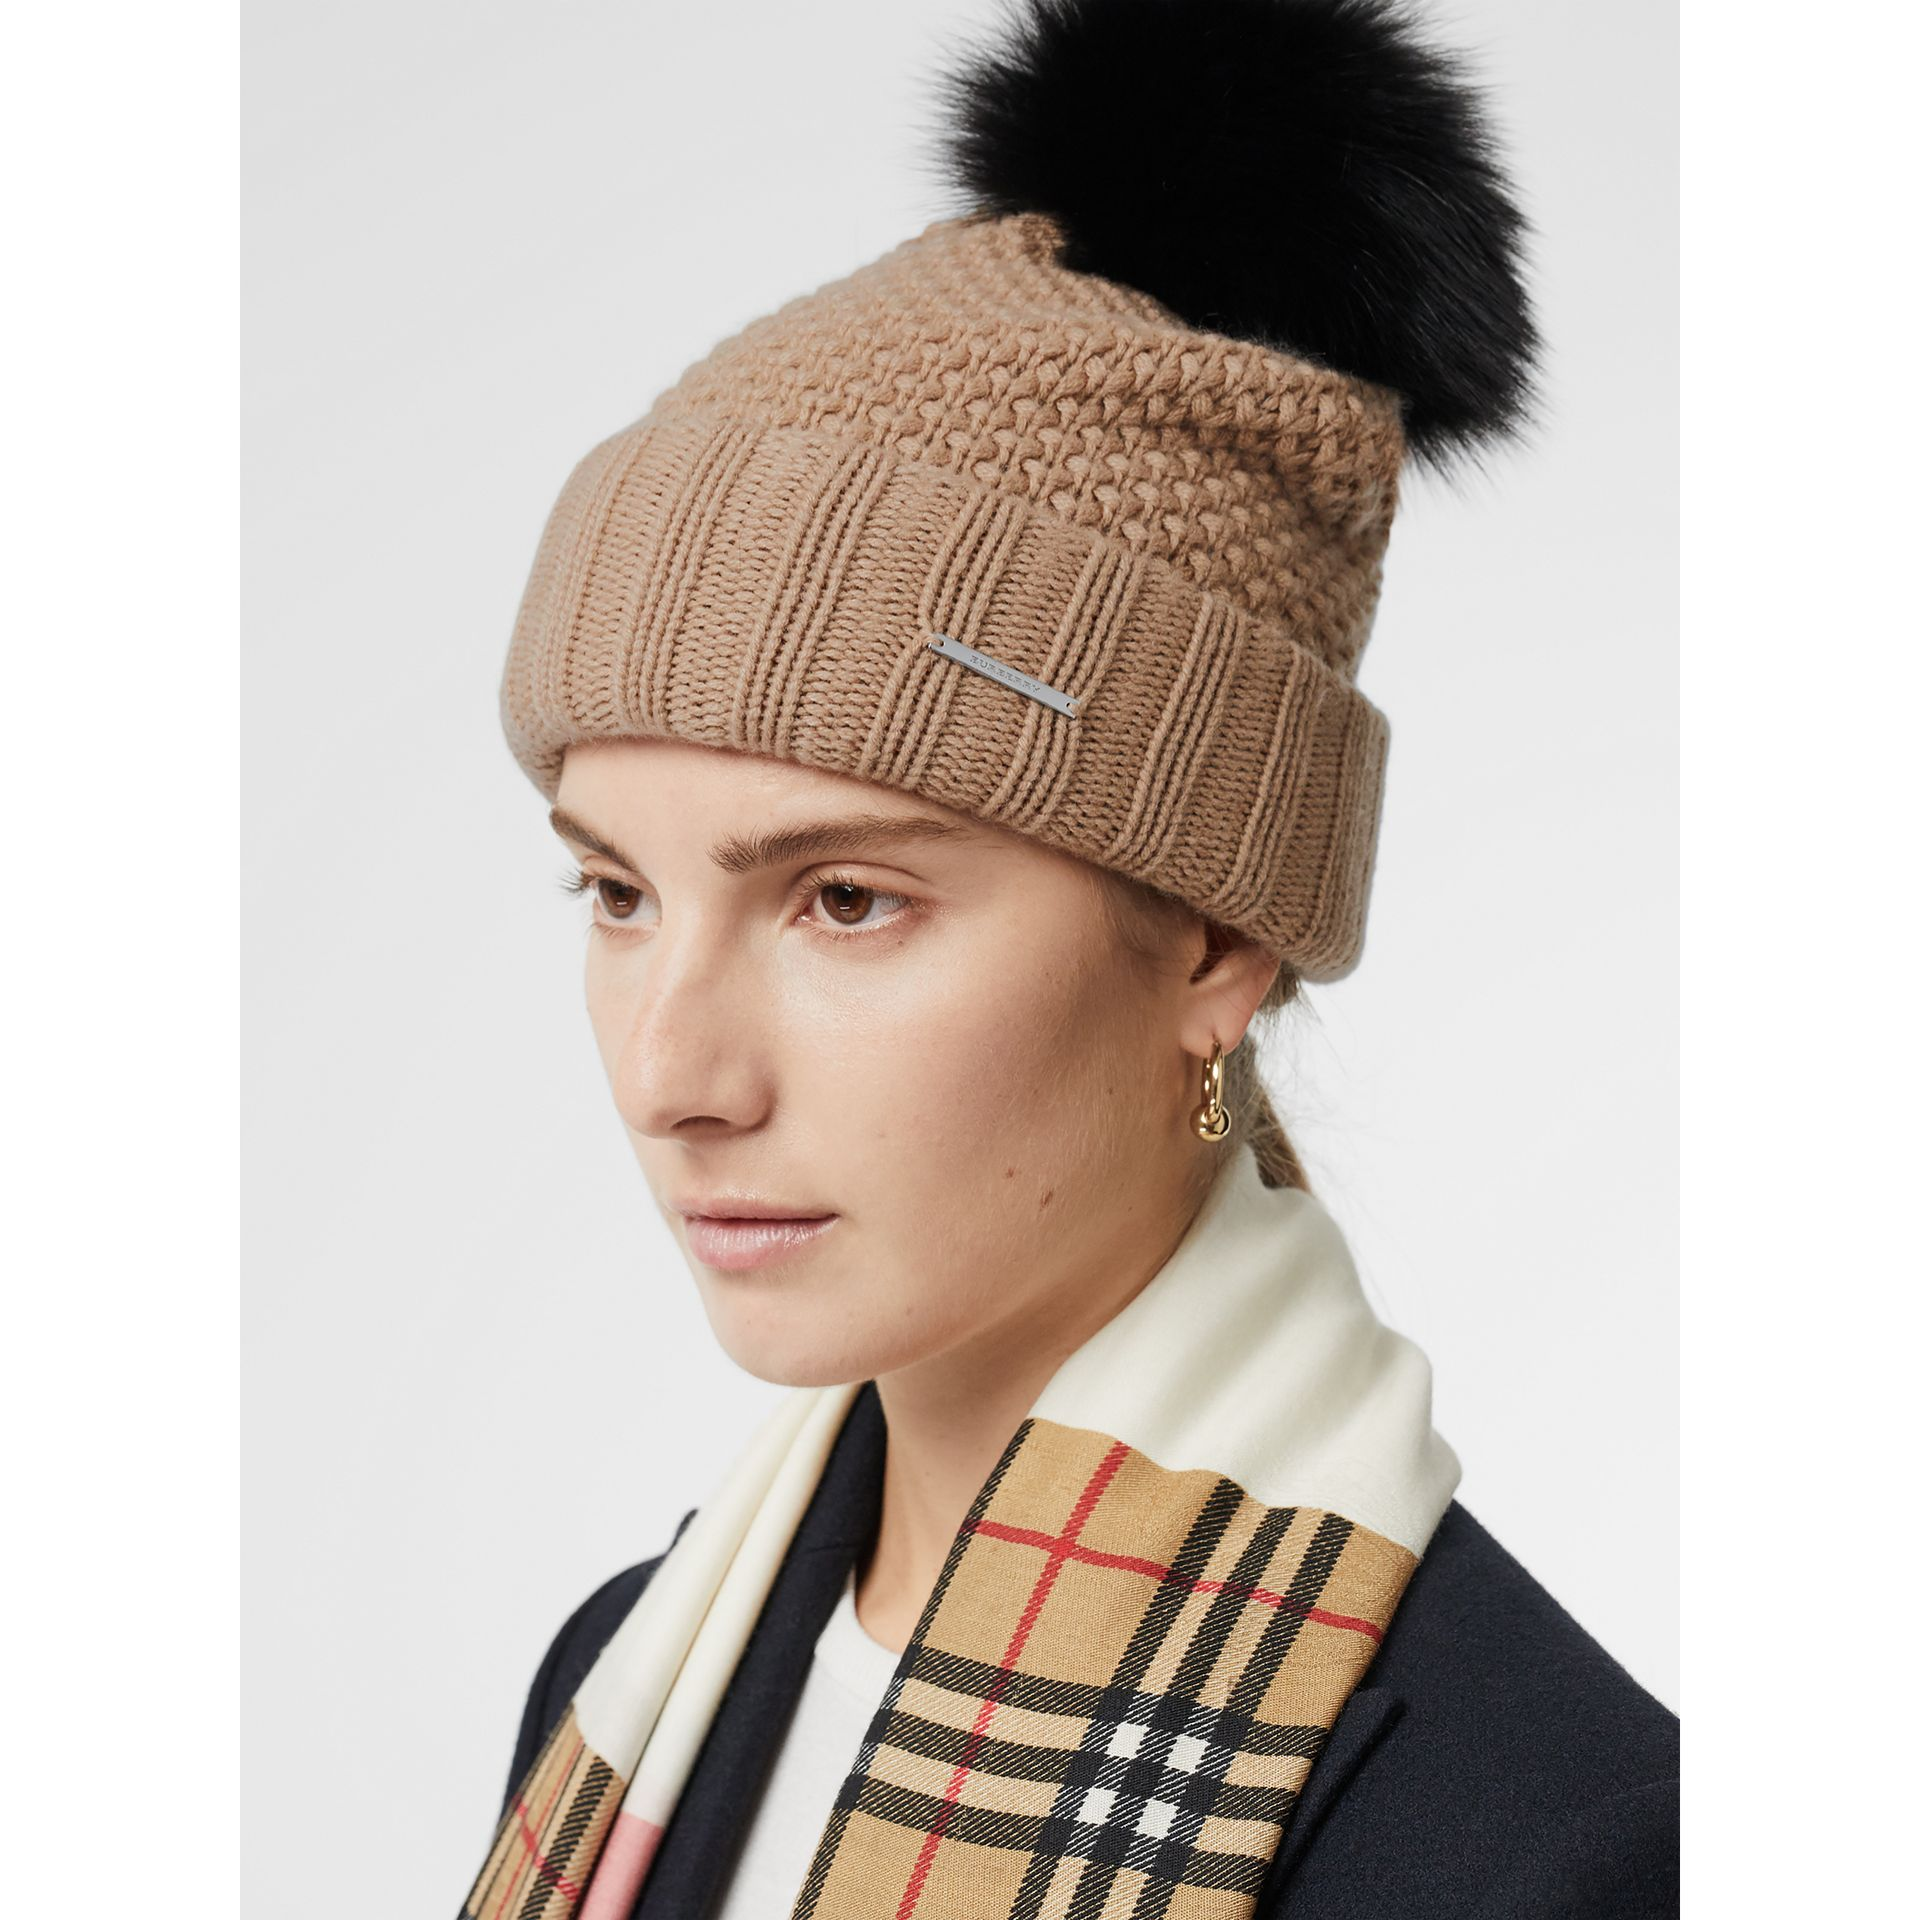 Fur Pom-Pom Wool Cashmere Beanie in Camel - Women | Burberry Canada - gallery image 2